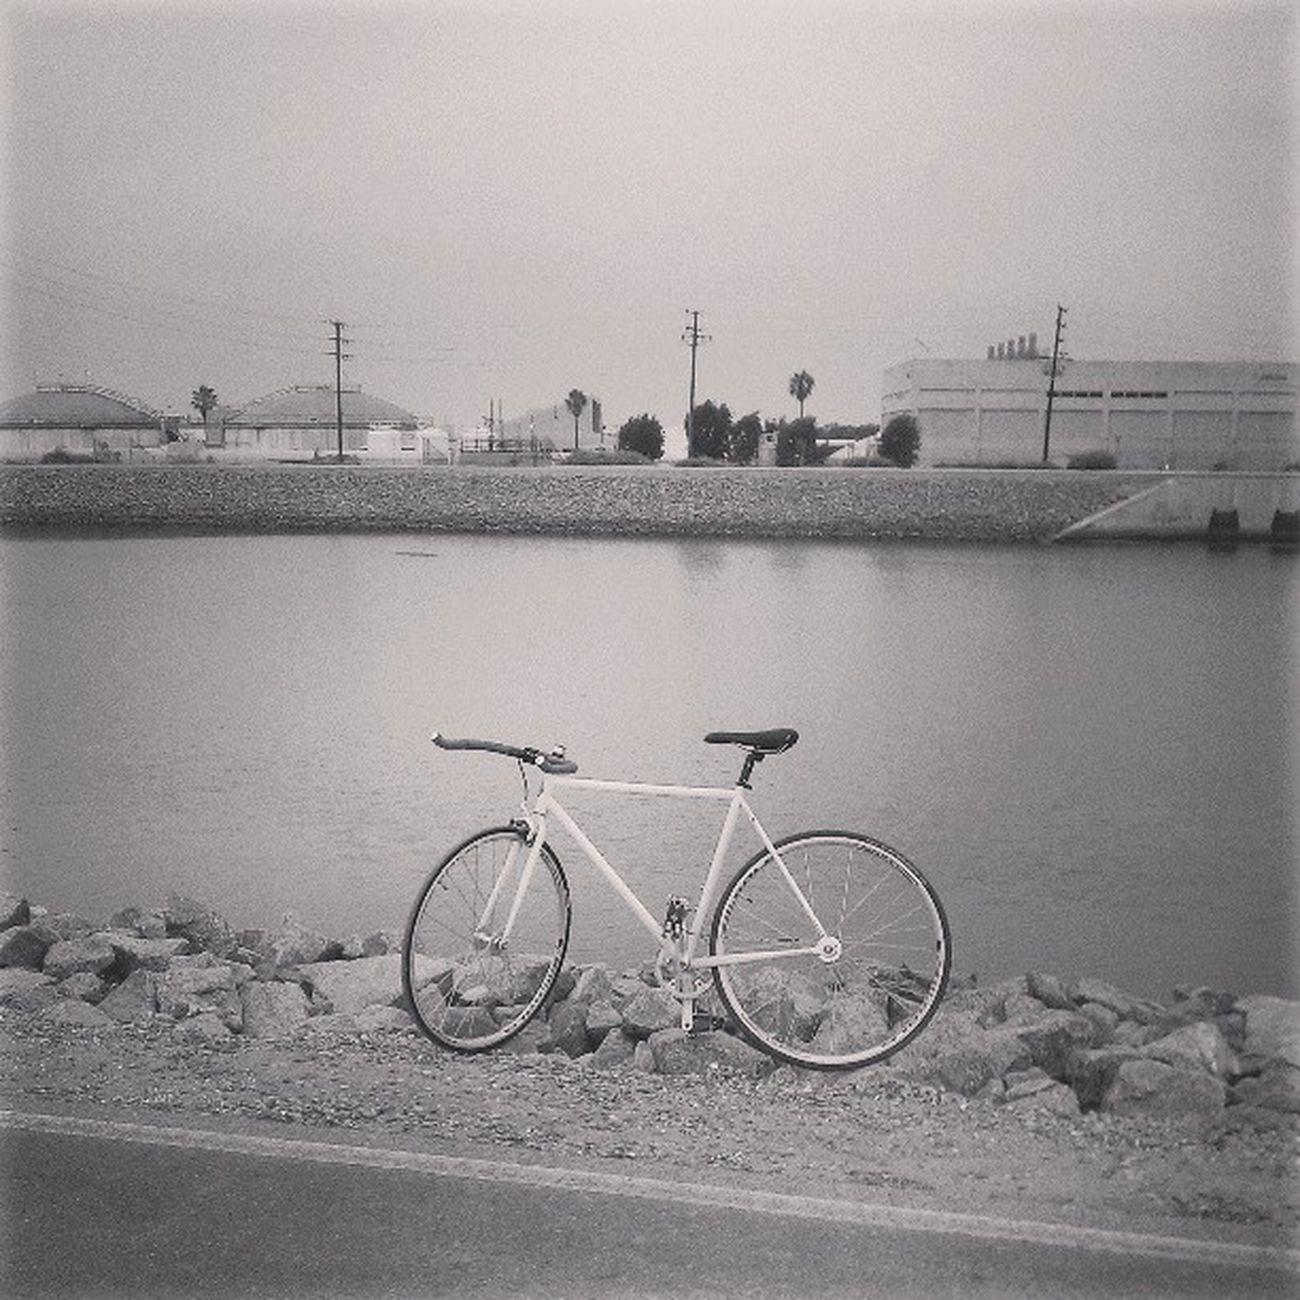 Got a flat all the way by the beach ): w/ jordanschlackman #fixedgear #tubeeater #santaana #river #trail #aclass #solo #bw #died #bike #instafixie #instadaily River Bike Solo Bw Trail Fixedgear Died Instadaily Aclass SantaAna Instafixie Tubeeater